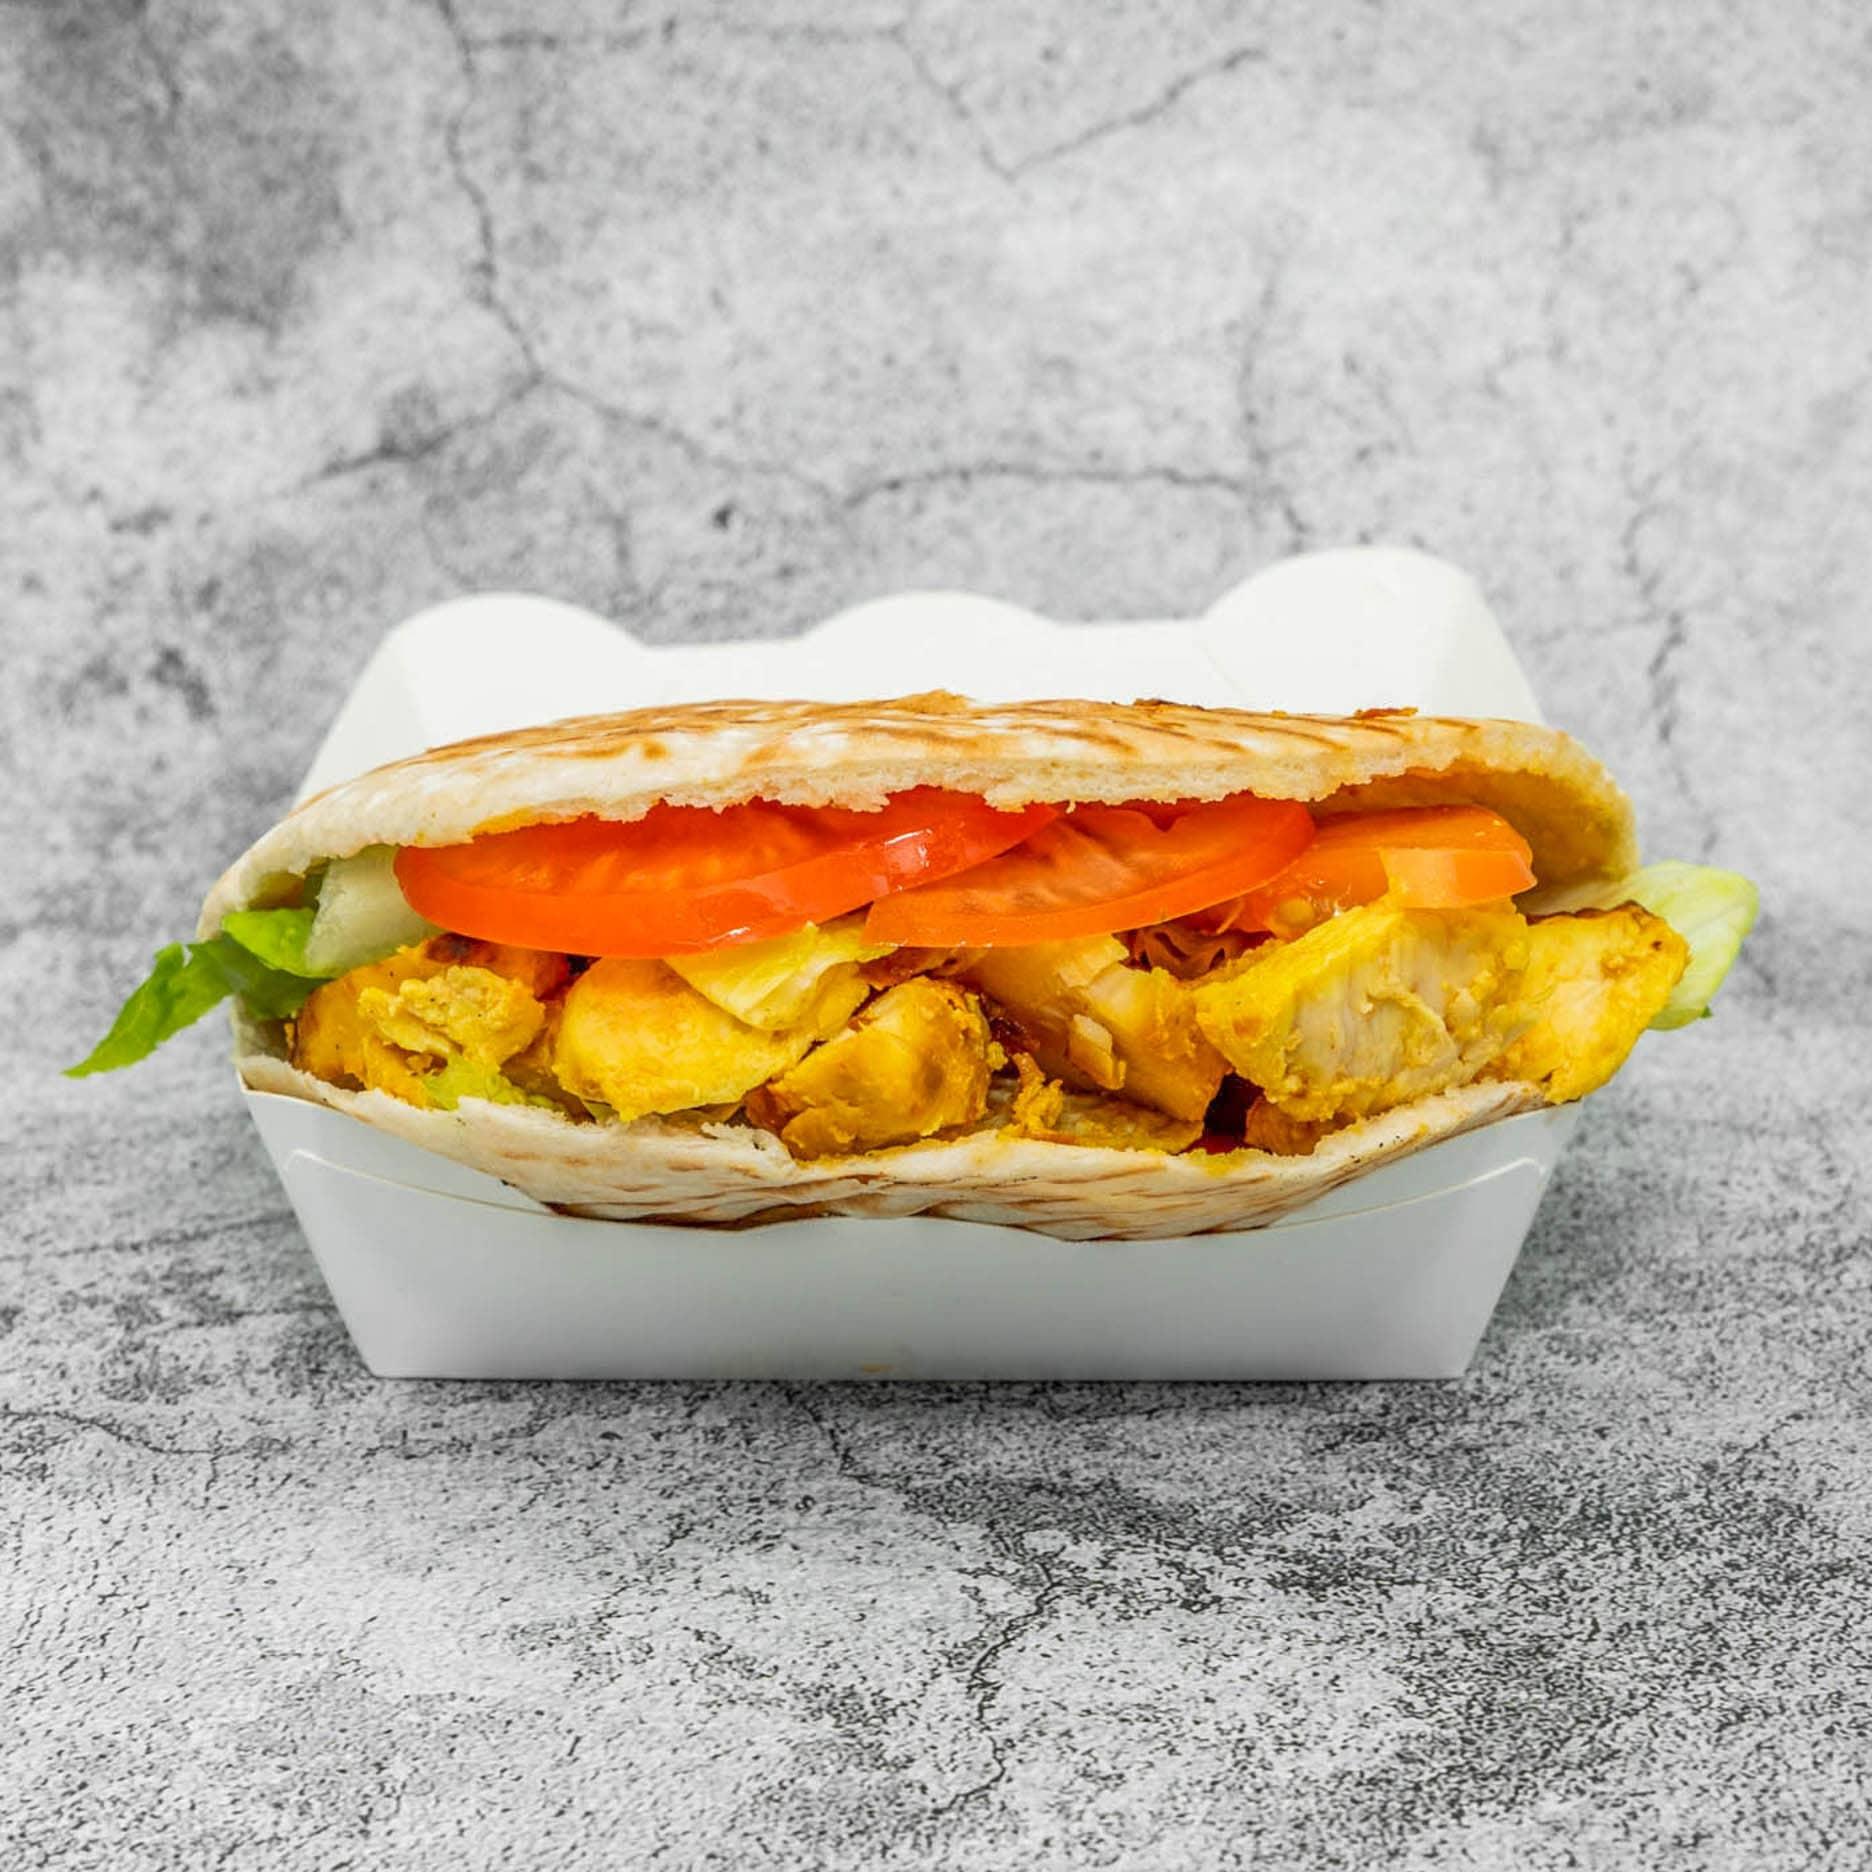 1 x Pita Pocket / Wrap (Chicken Shish / Authentic Falafel) + Soft Drink